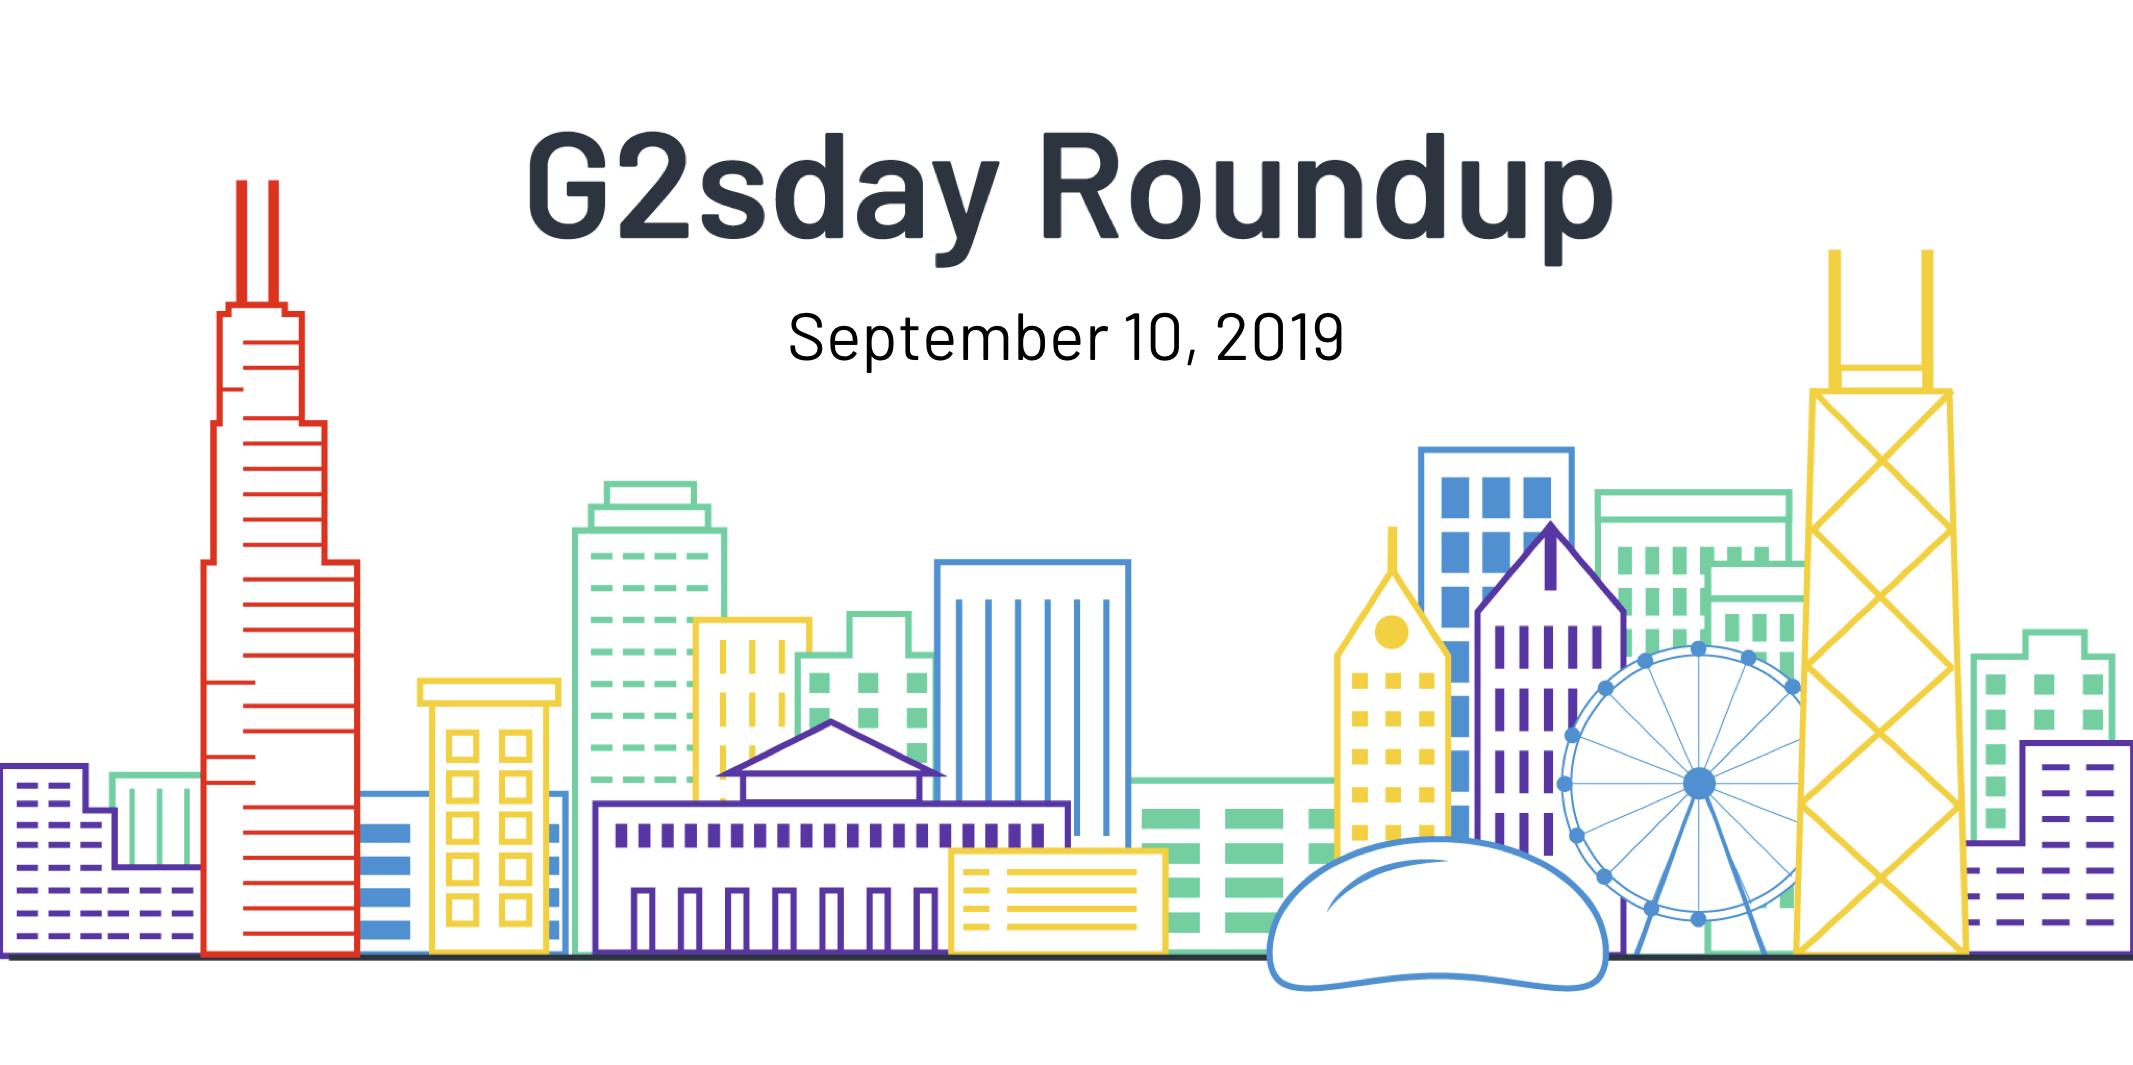 G2sday Roundup 9-10-2019